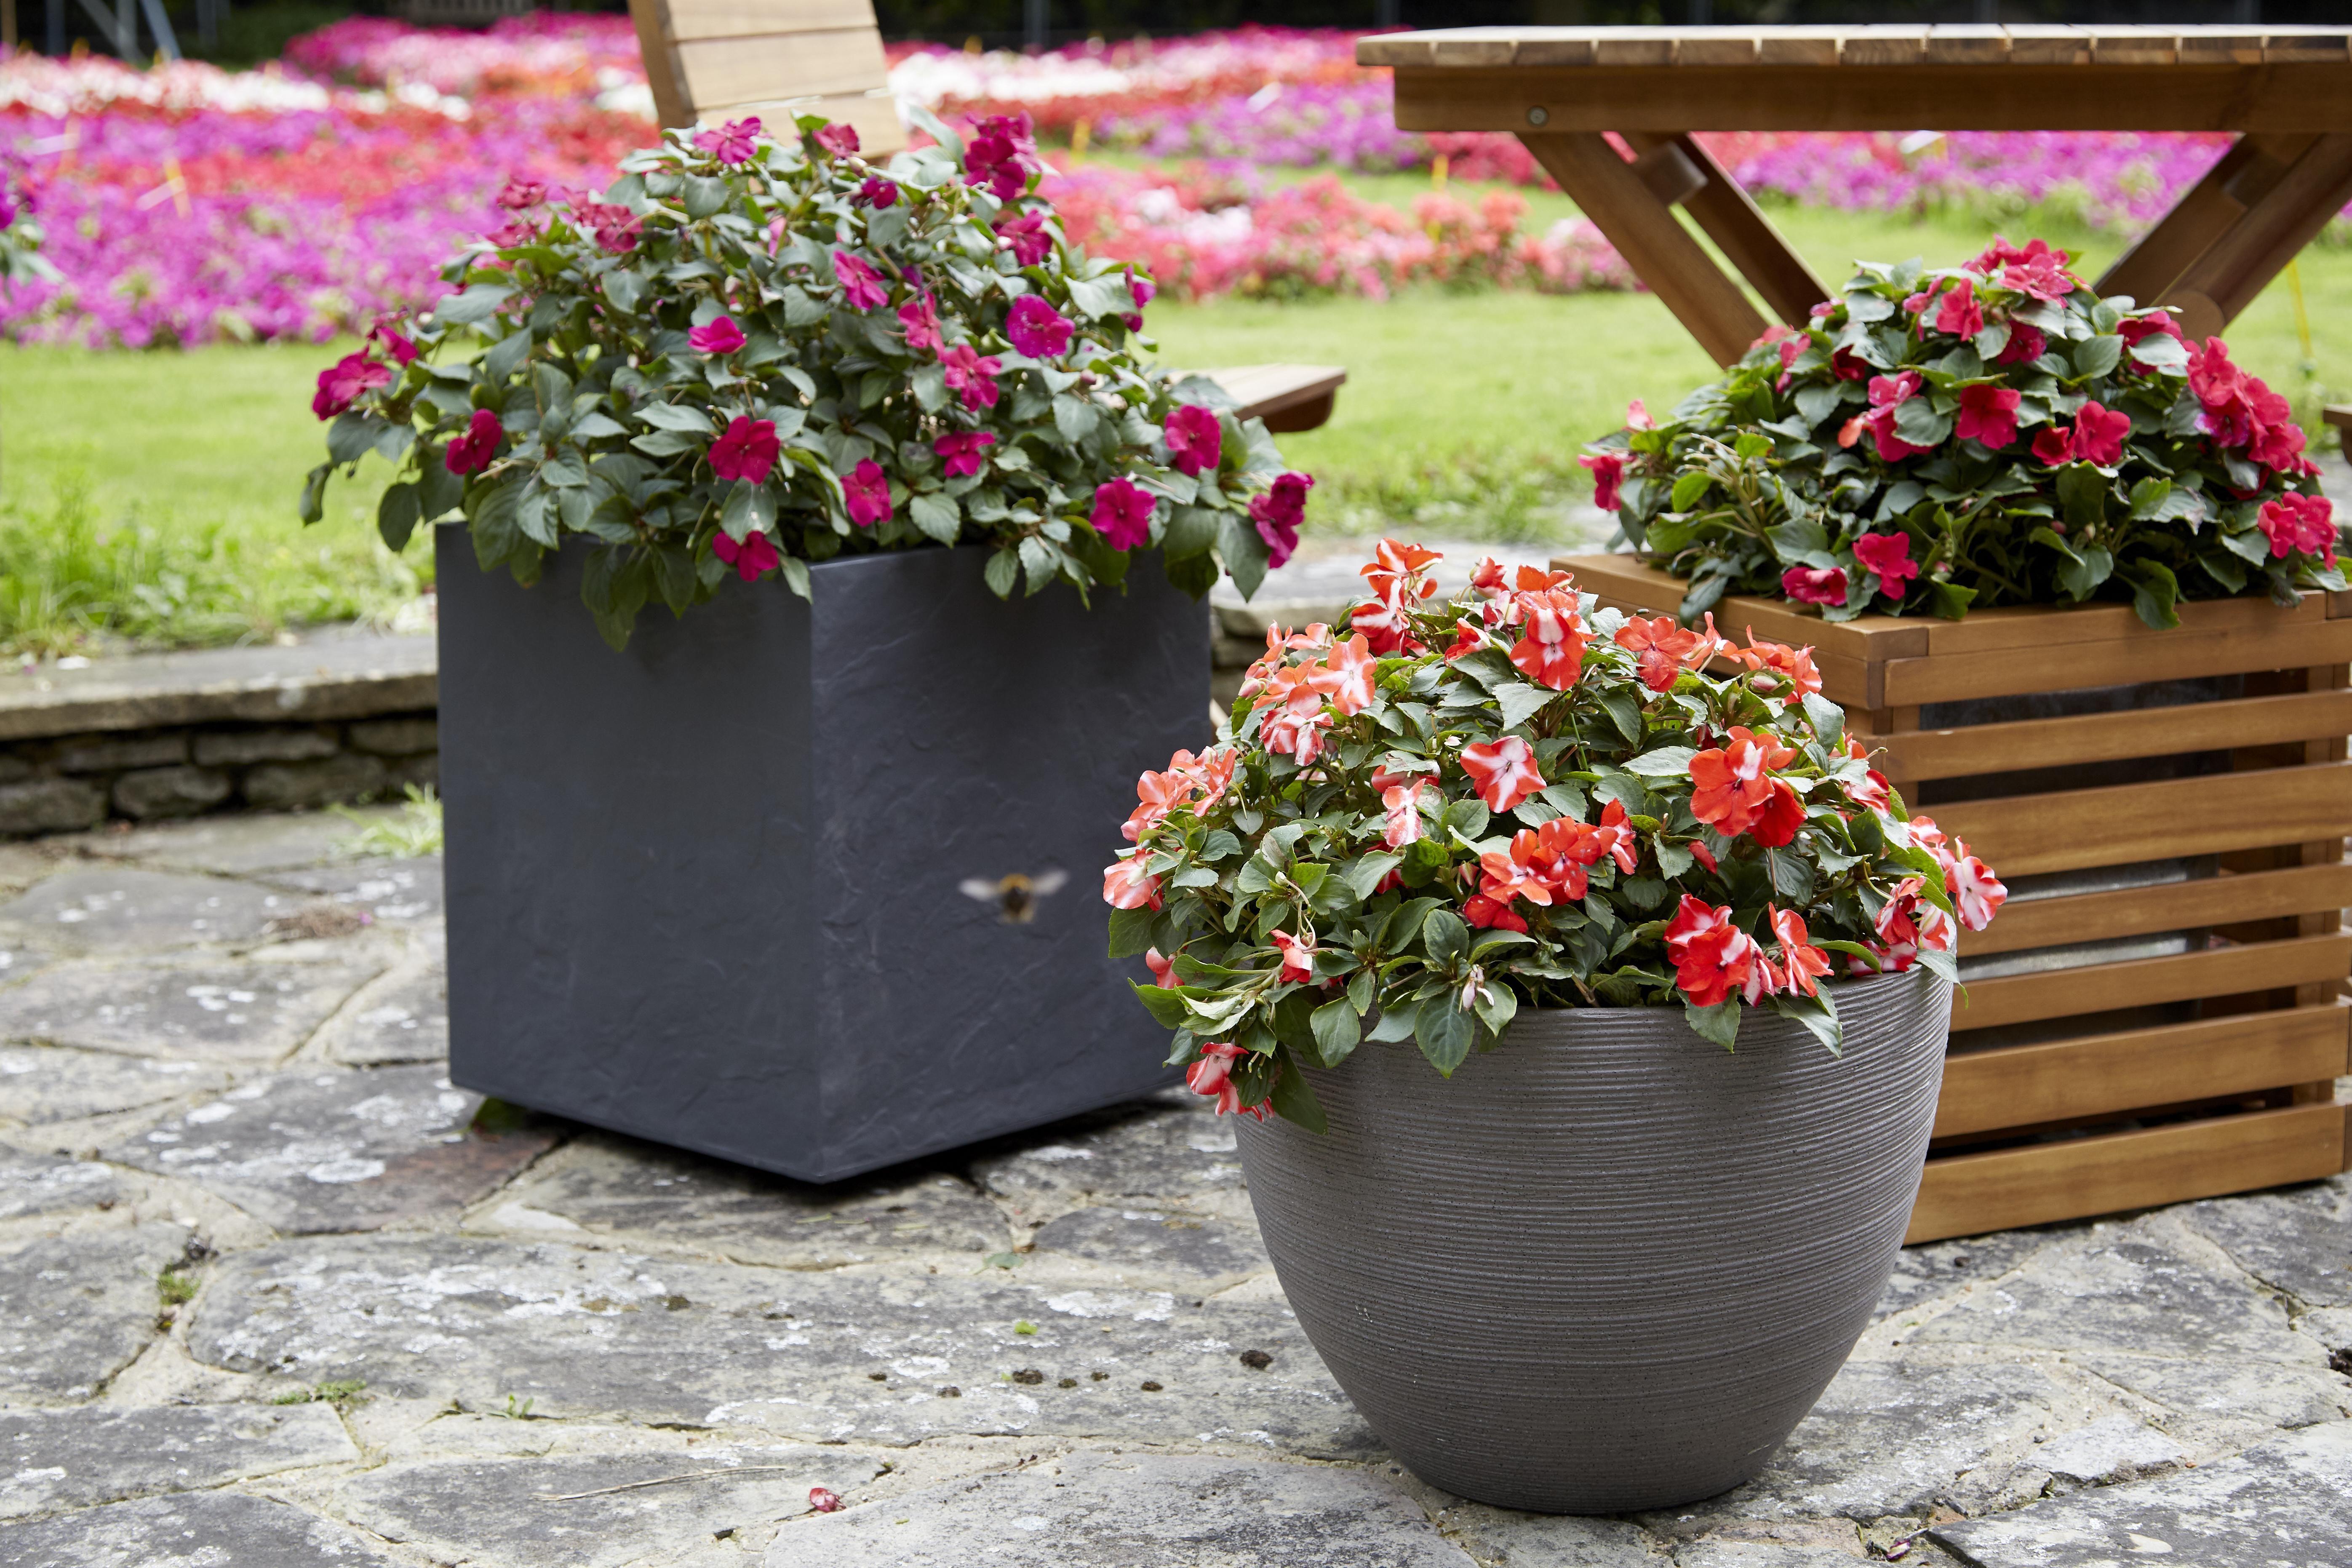 B&q Garden Plants And Bulbs